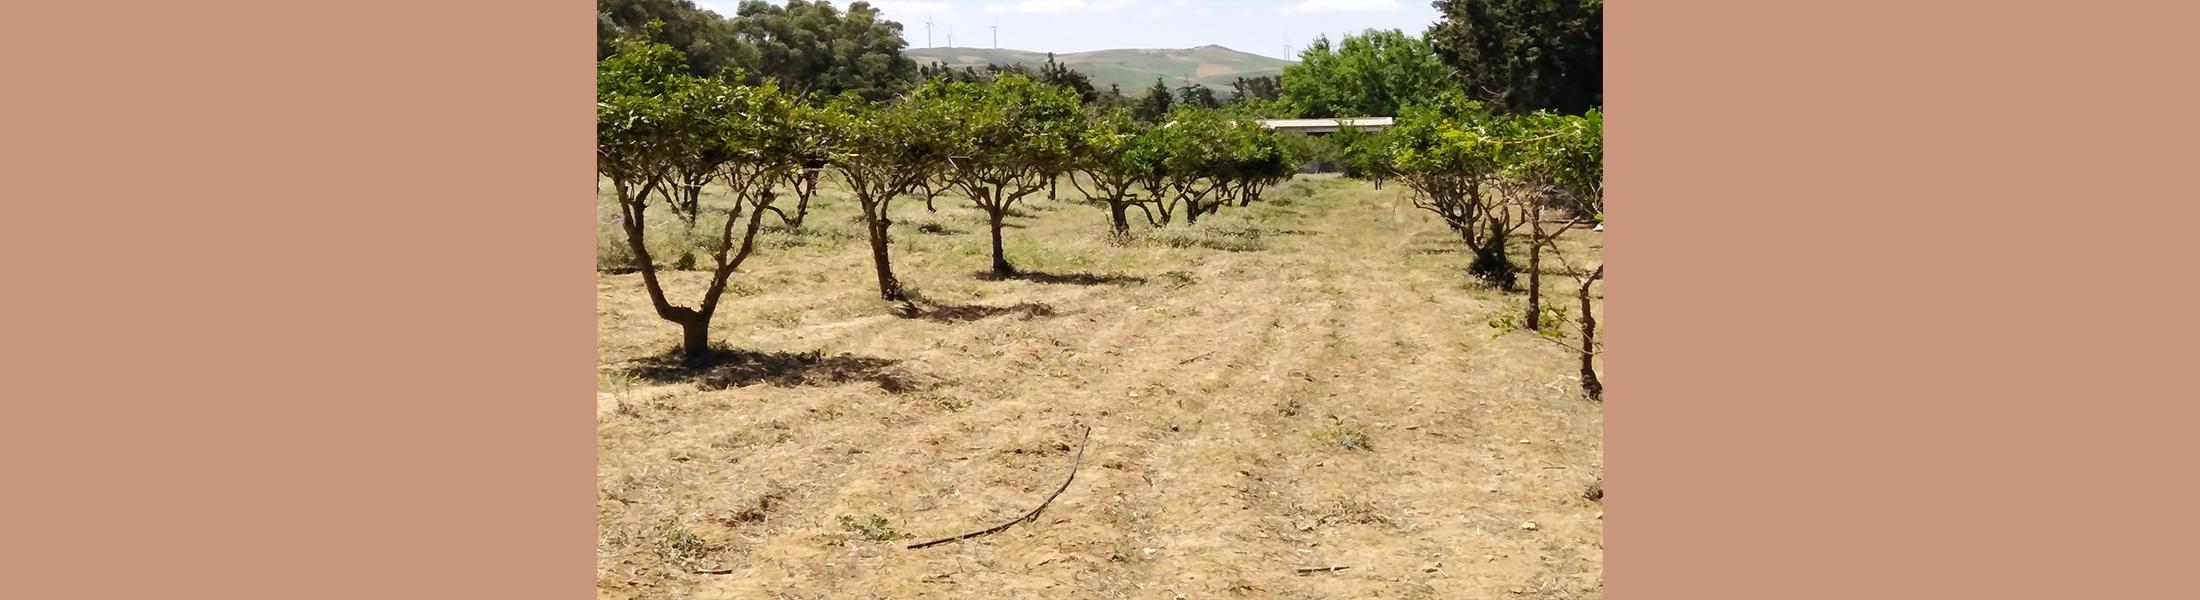 Terrain Ras Djebel 2 - Bizerte (Appel d'Offres N° 08/2020)